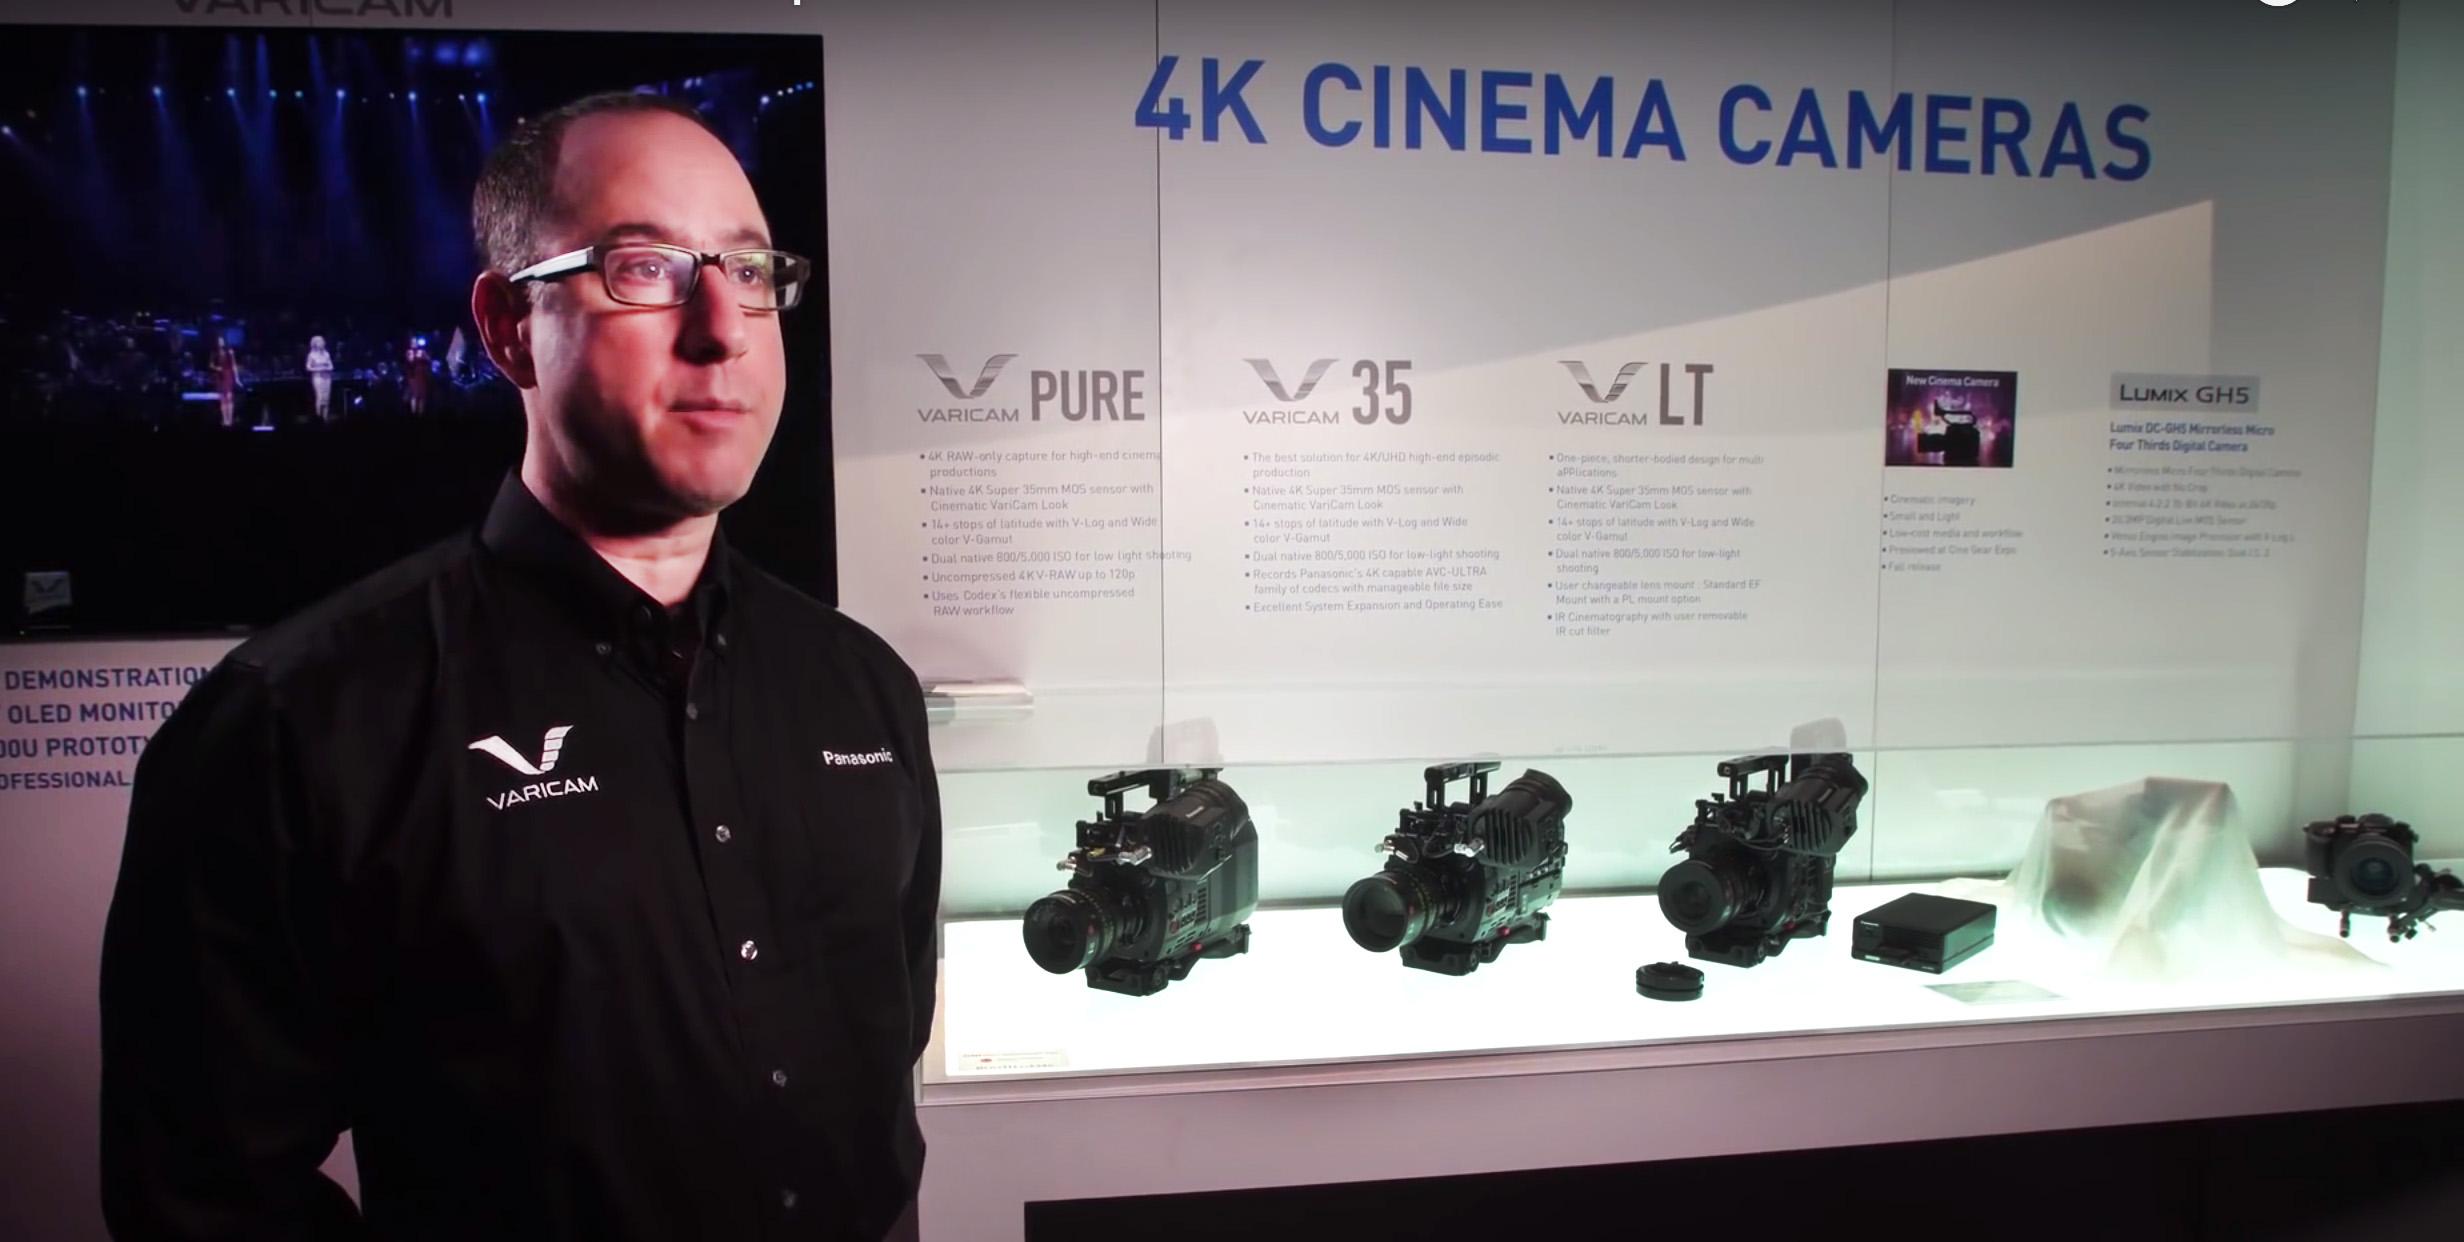 Panasonic Steve Cooperman, Senior Pdct Mgr Cine e& brodcast copie